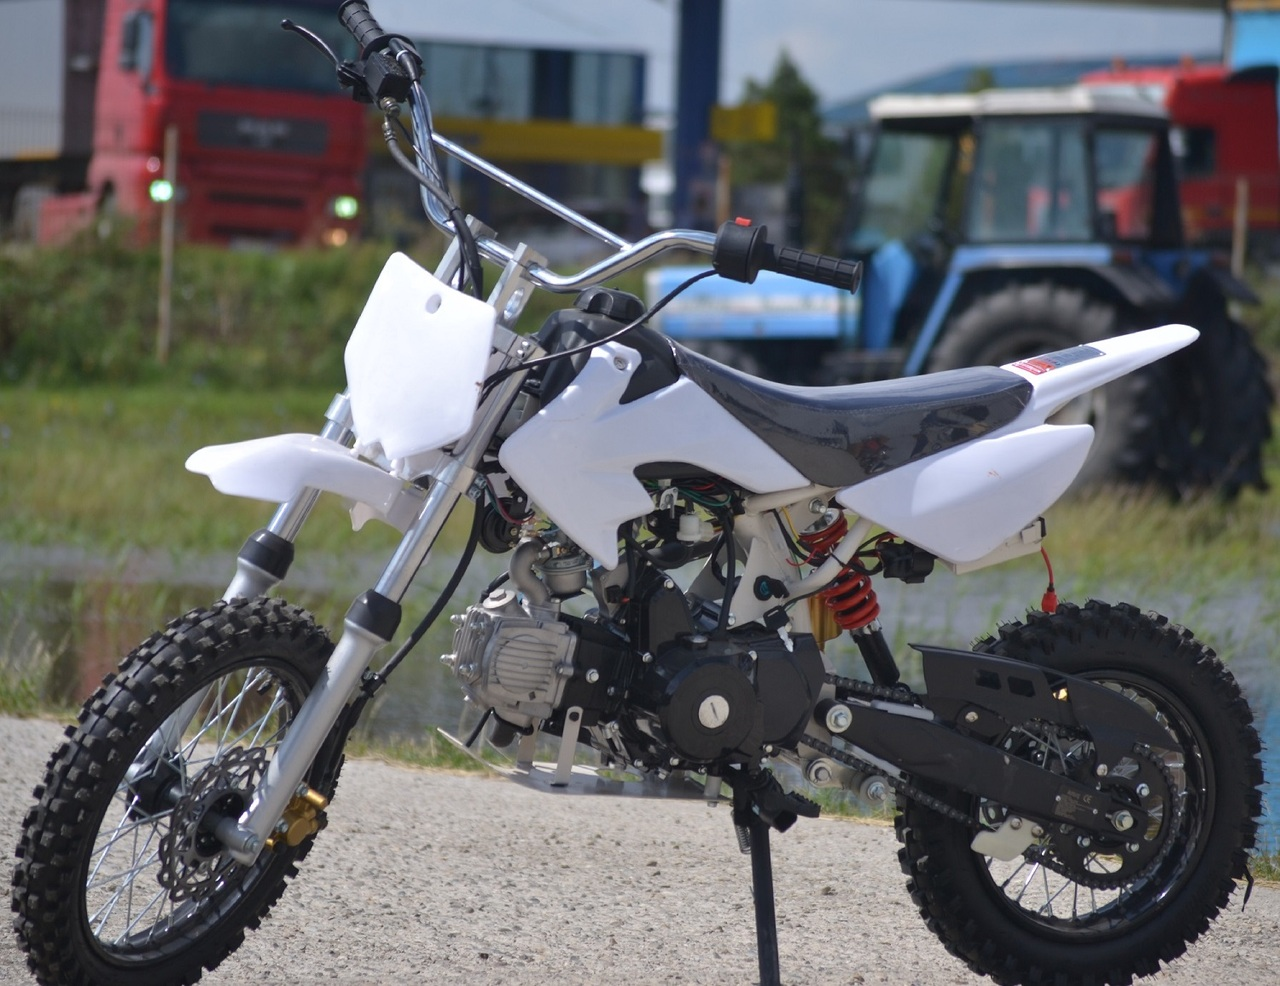 Motocicleta Loncin 125cc Automata Import Germania